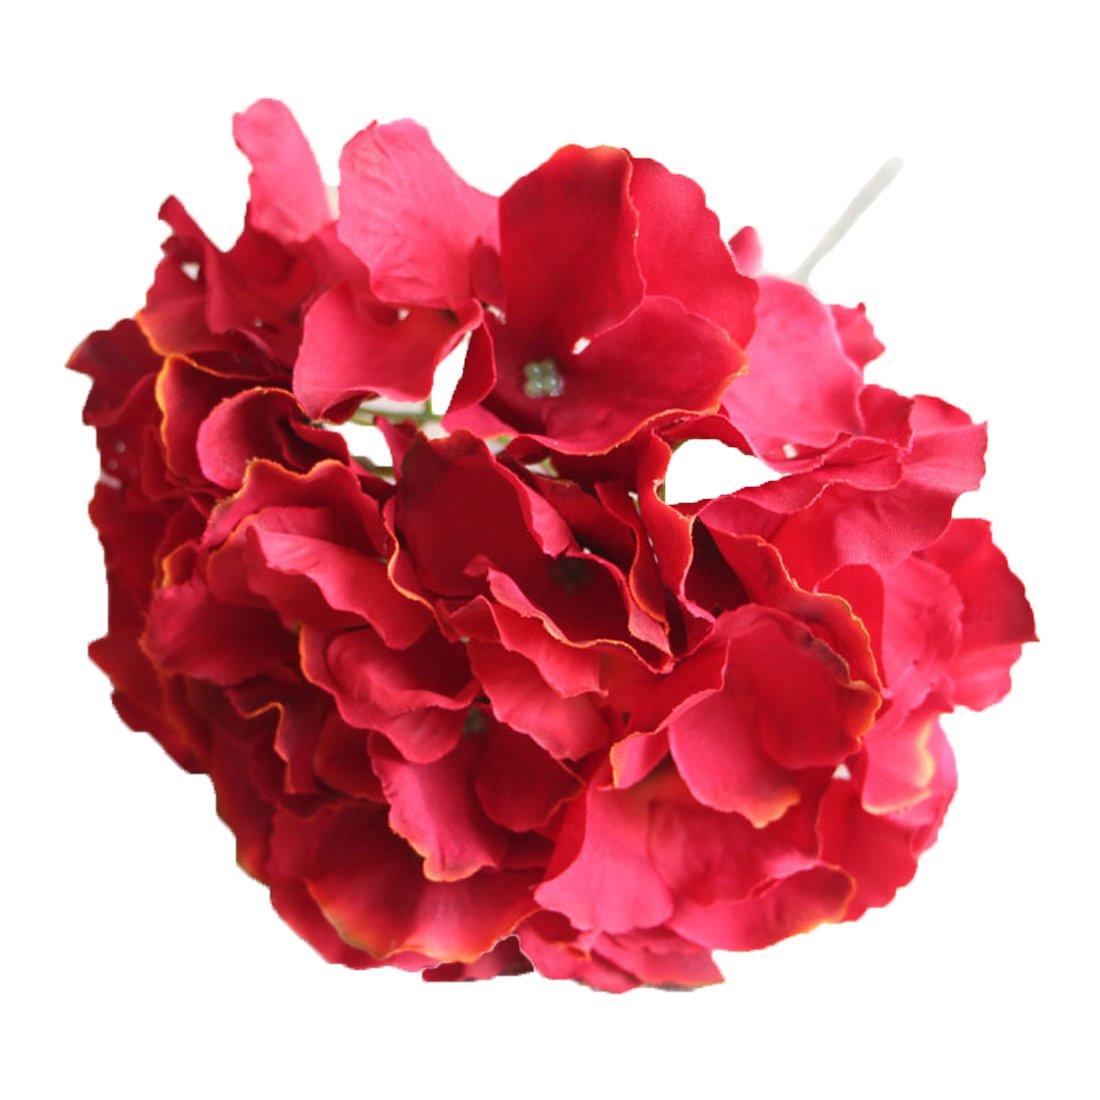 Calcifer 10 Pcs Mallorca Hydrangea Flowers Artificial Flowers for Home Garden Wedding Bohemia Hat Decor (Champagne)